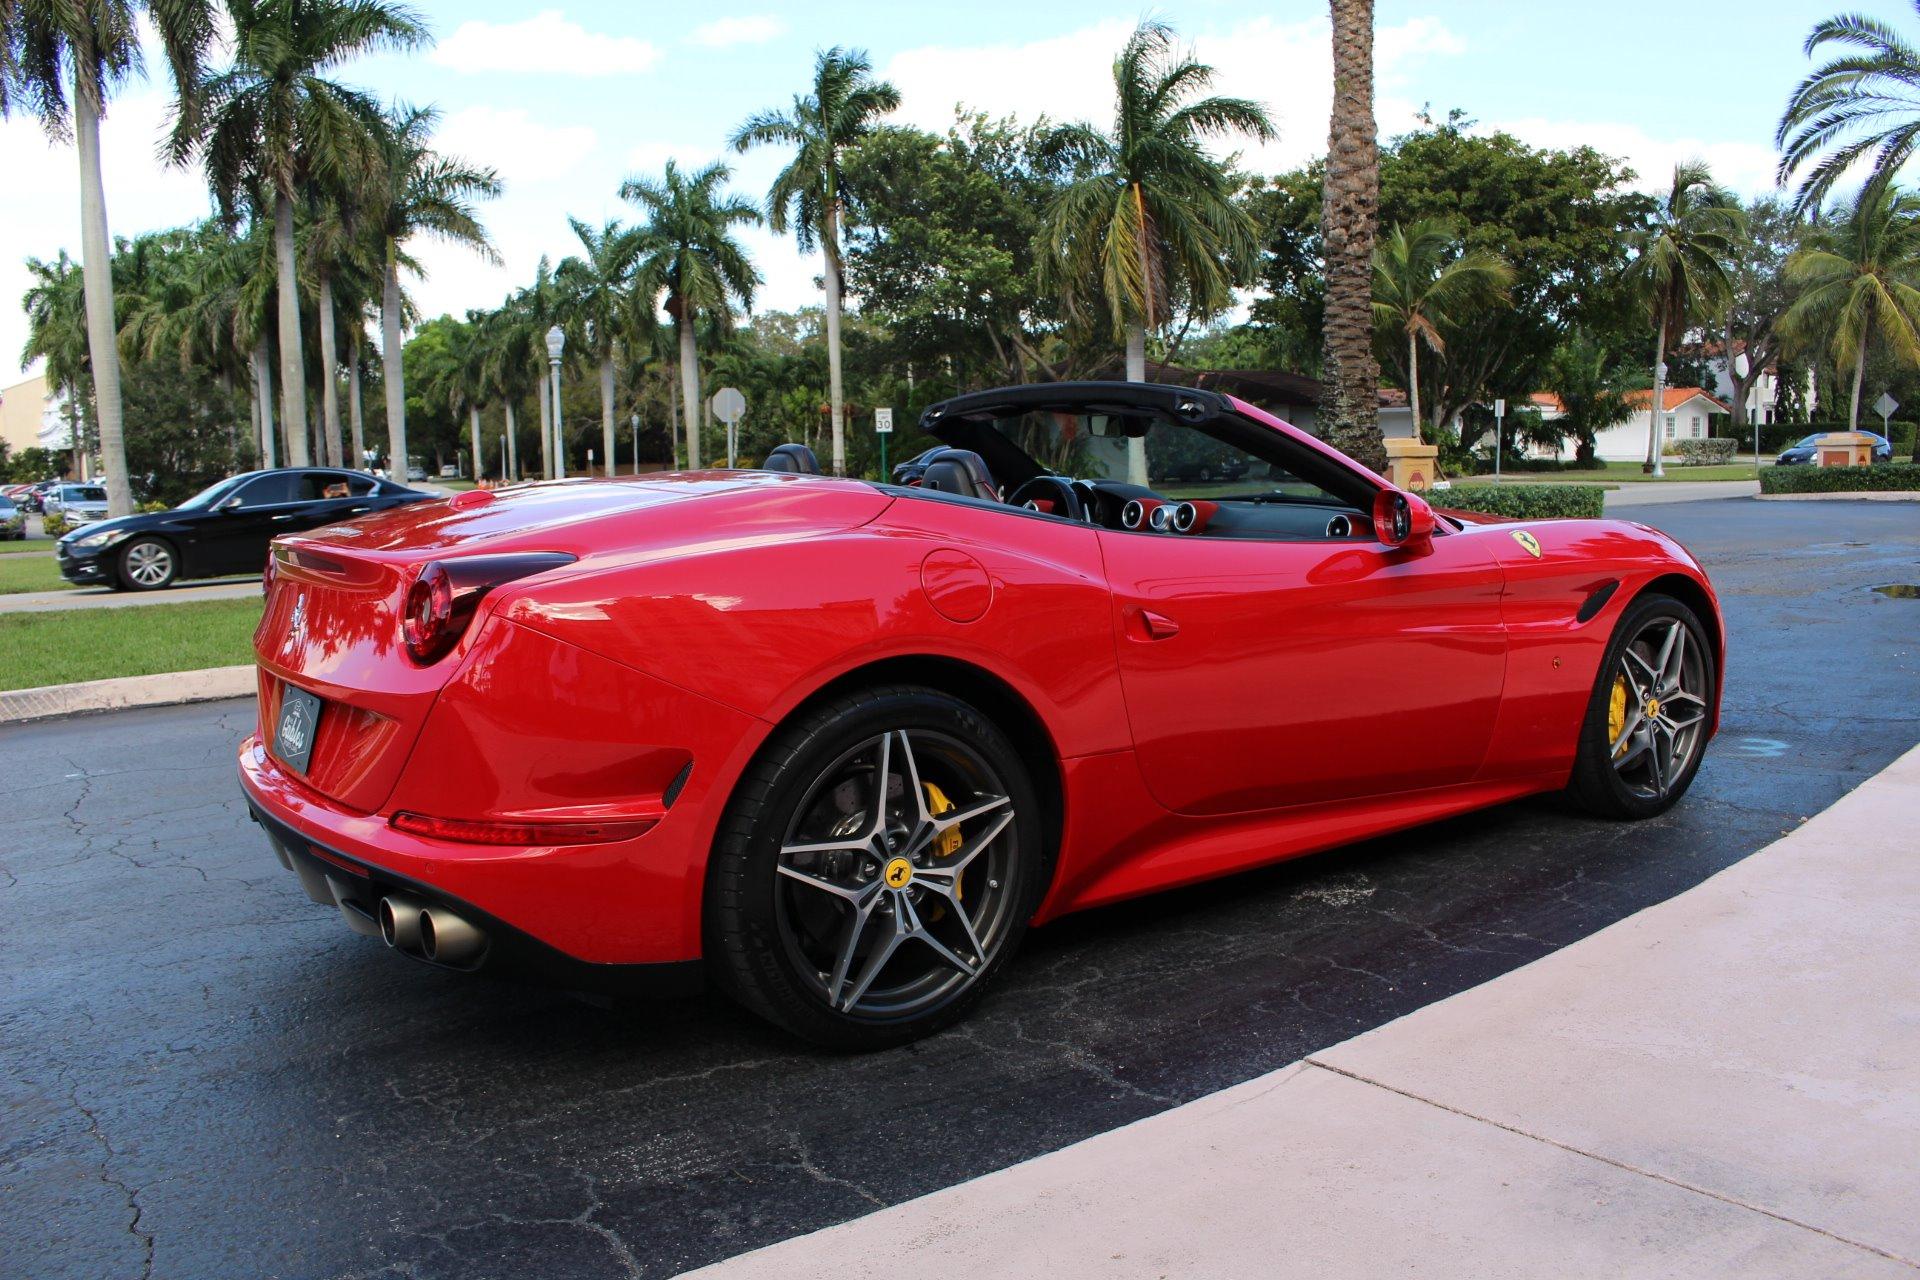 Used 2016 Ferrari California T For Sale ($132,850)   The ...